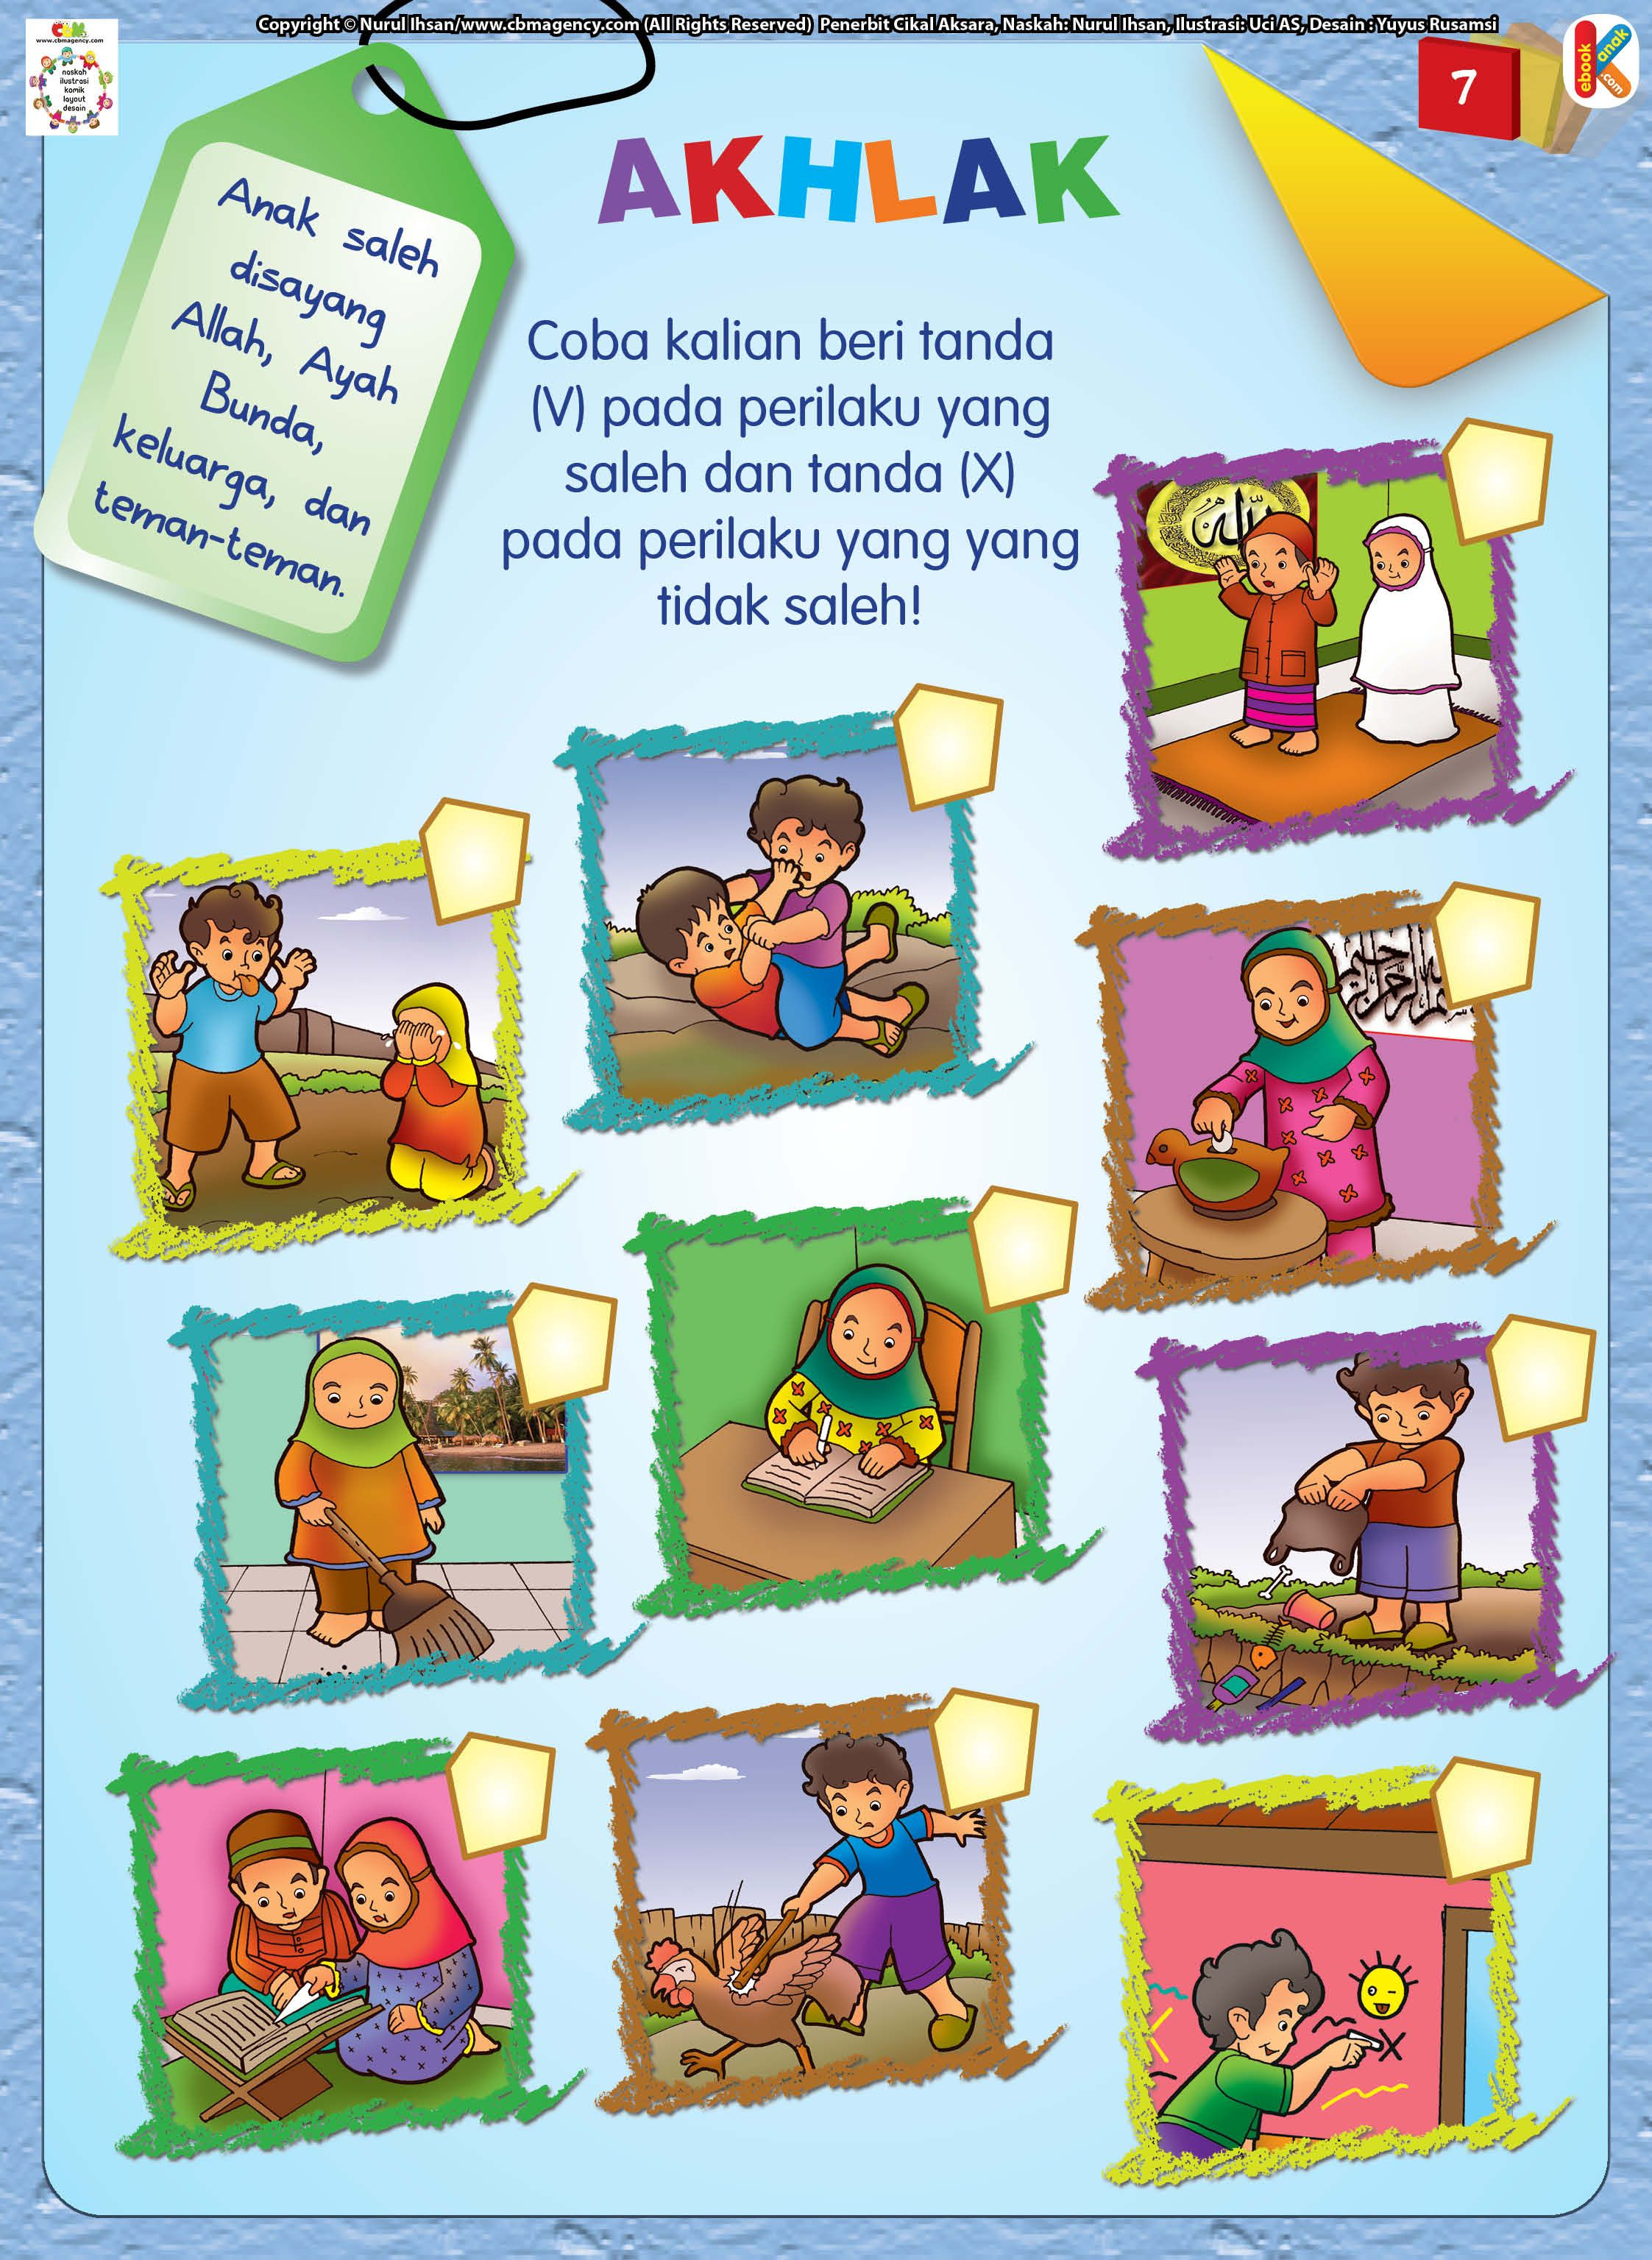 Worksheet Agama Islam Untuk Tk Printable Worksheets And Activities For Teachers Parents Tutors And Homeschool Families